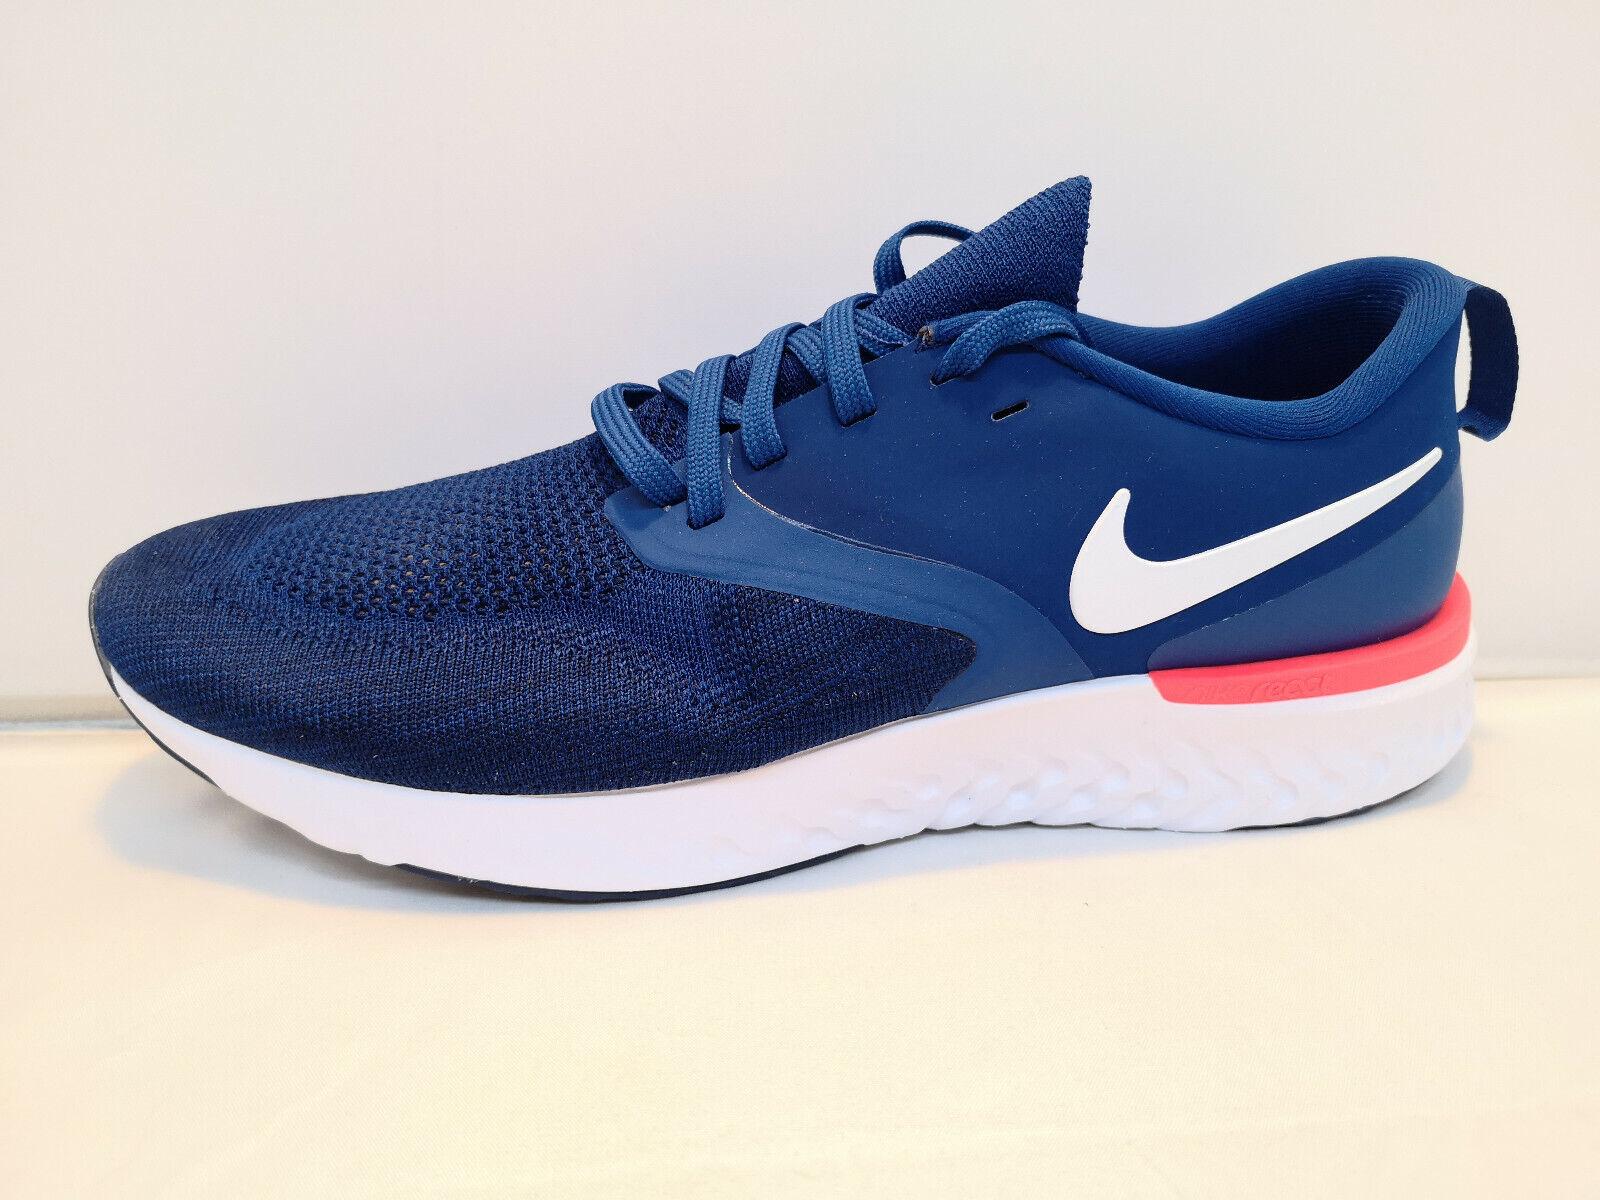 Nike Zapatillas caballero odysse react 2 flyknit (ah1015-400) en azul